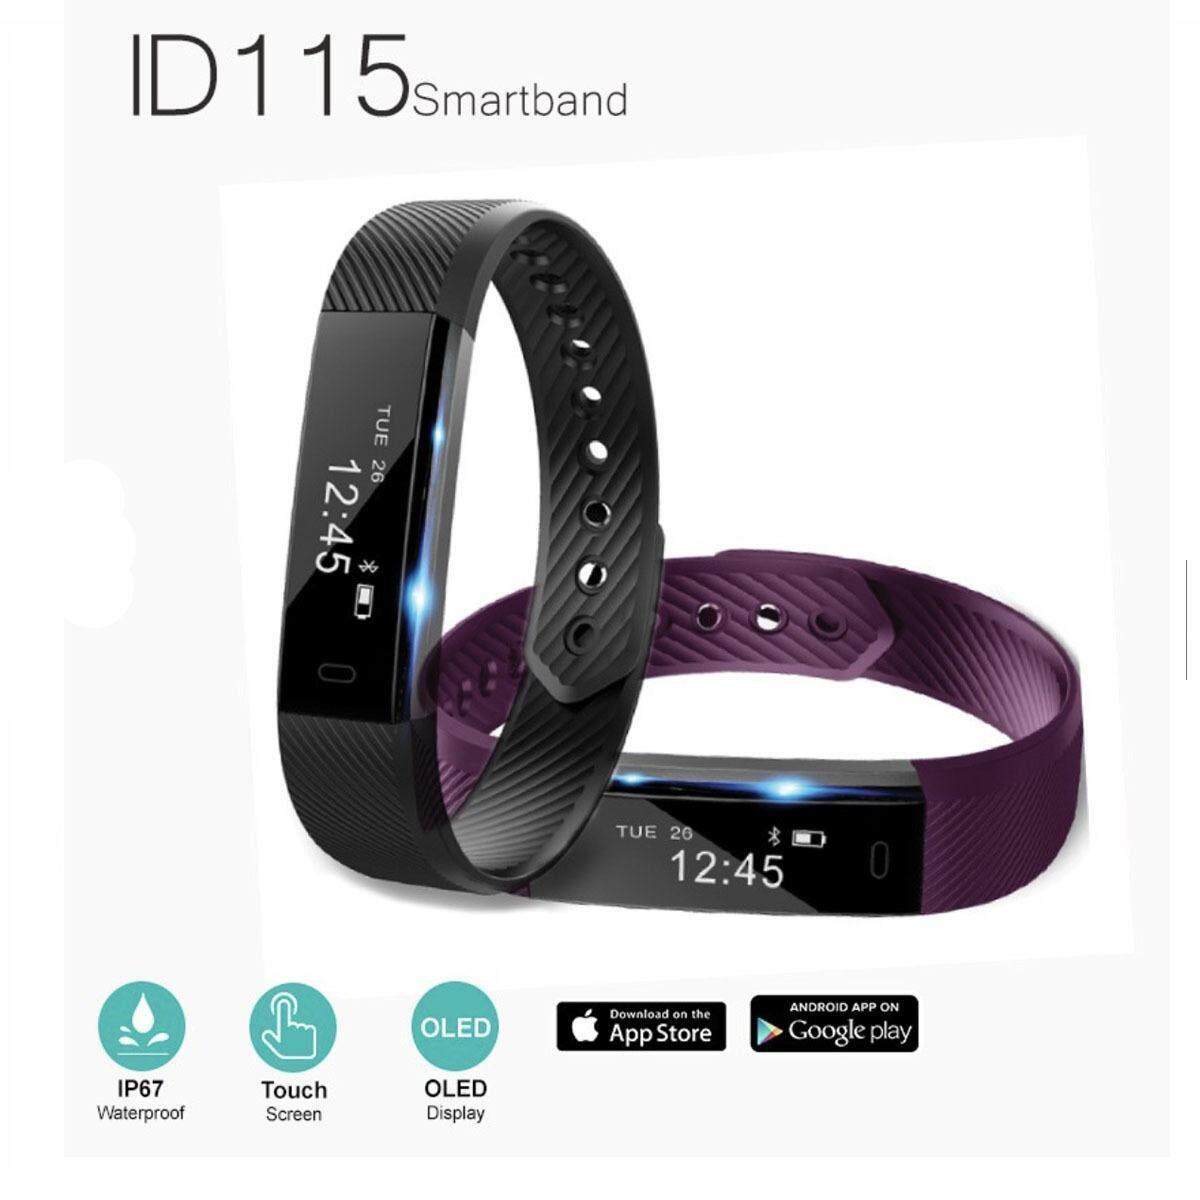 Tekkashop ID115 PRO Fitness Tracker Smart Watch Wristband Smartband (Android/IOS), Green